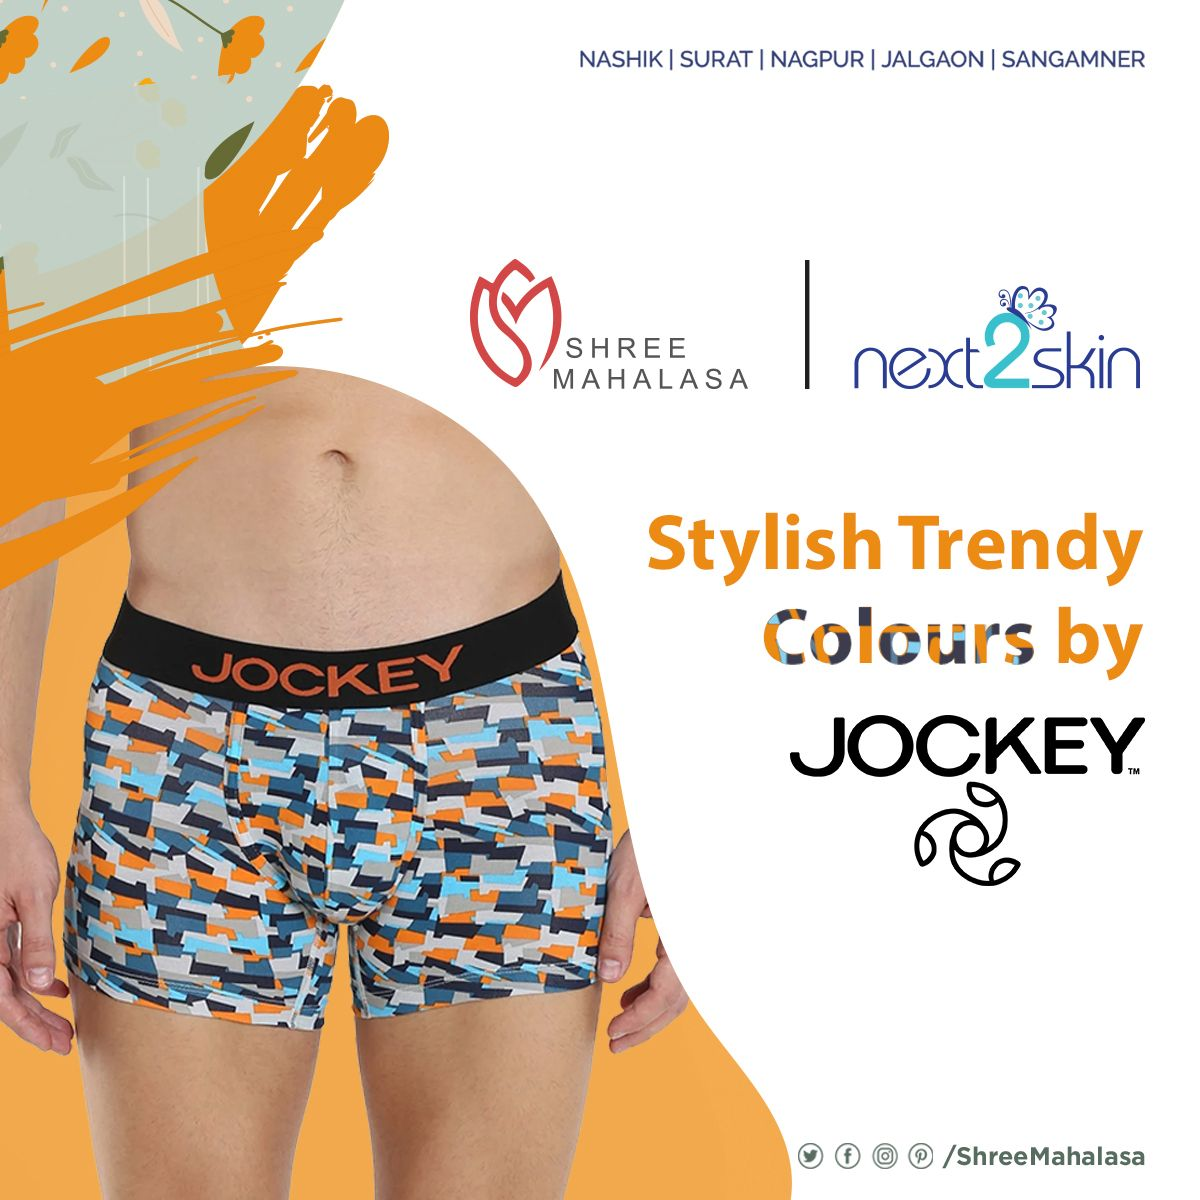 Spice it up with new and trendy coloured underwear by Jockey . . . . . #ShreeMahalasa #Next2Skin #VanHeusen #Briefs #Innerwear #underpants #Confort #Jalgaon #Nagpur #Surat #Nashik #Sangamner https://t.co/5J3kaCI1Mr